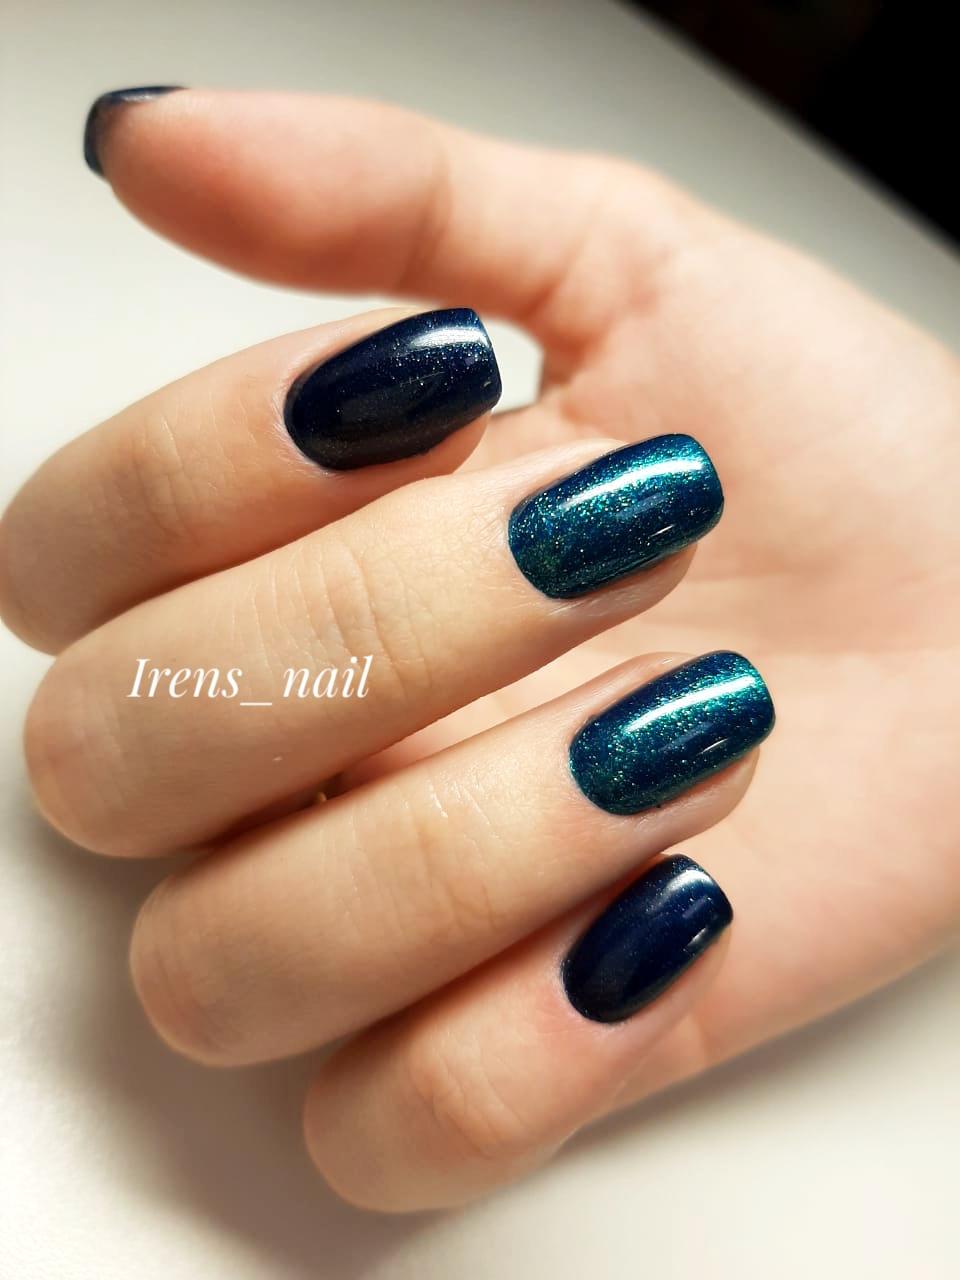 Маникюр в тёмно-синем цвете с синими блёстками.